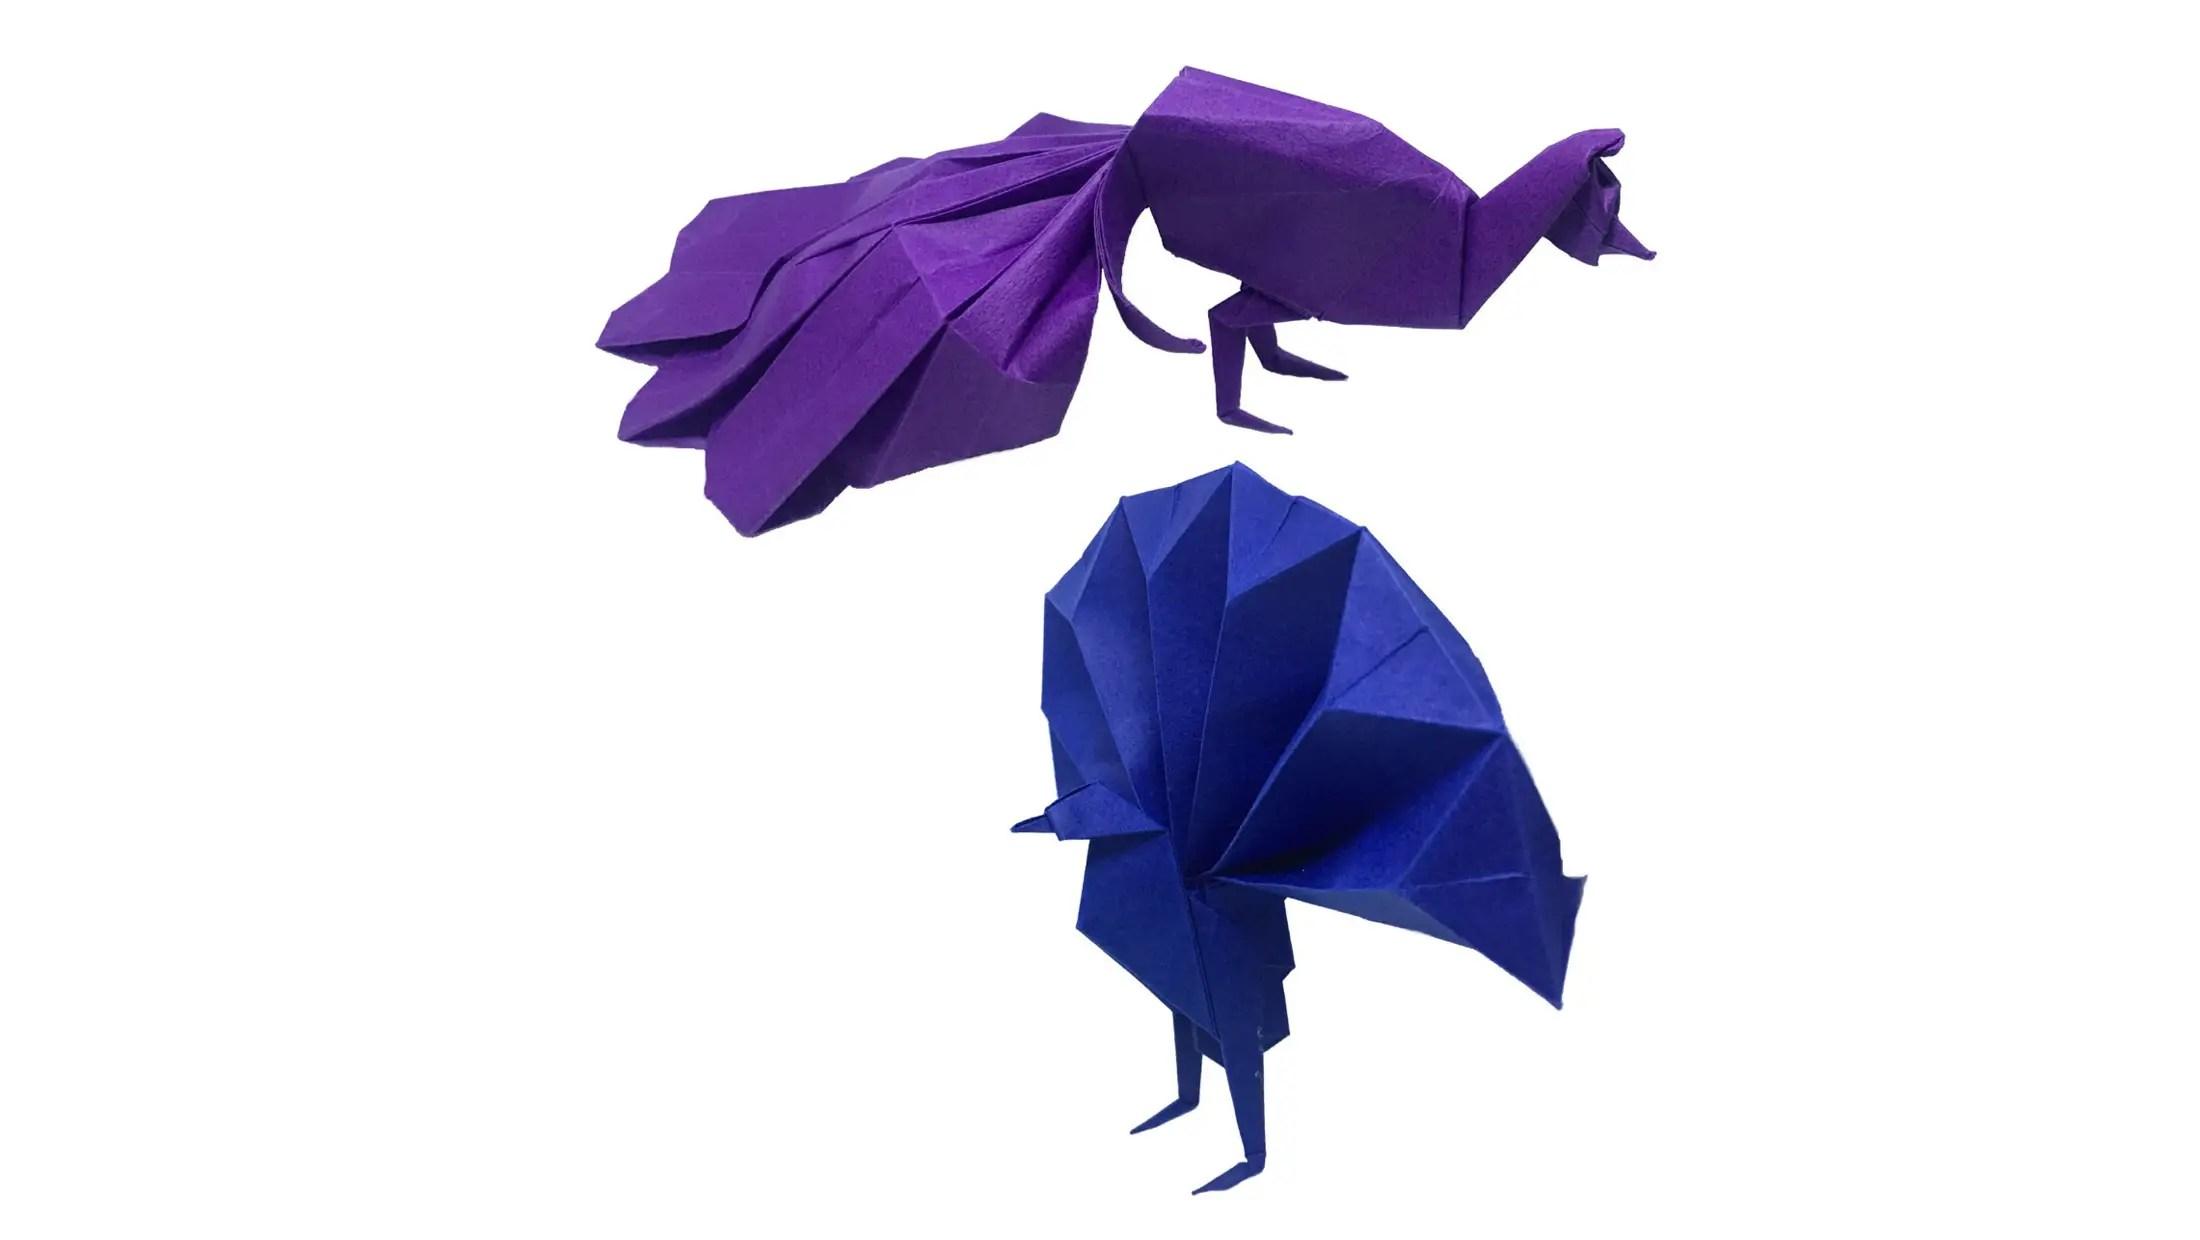 peacock bird diagram ez go golf cart wiring gas a pair of origami peacocks expressions